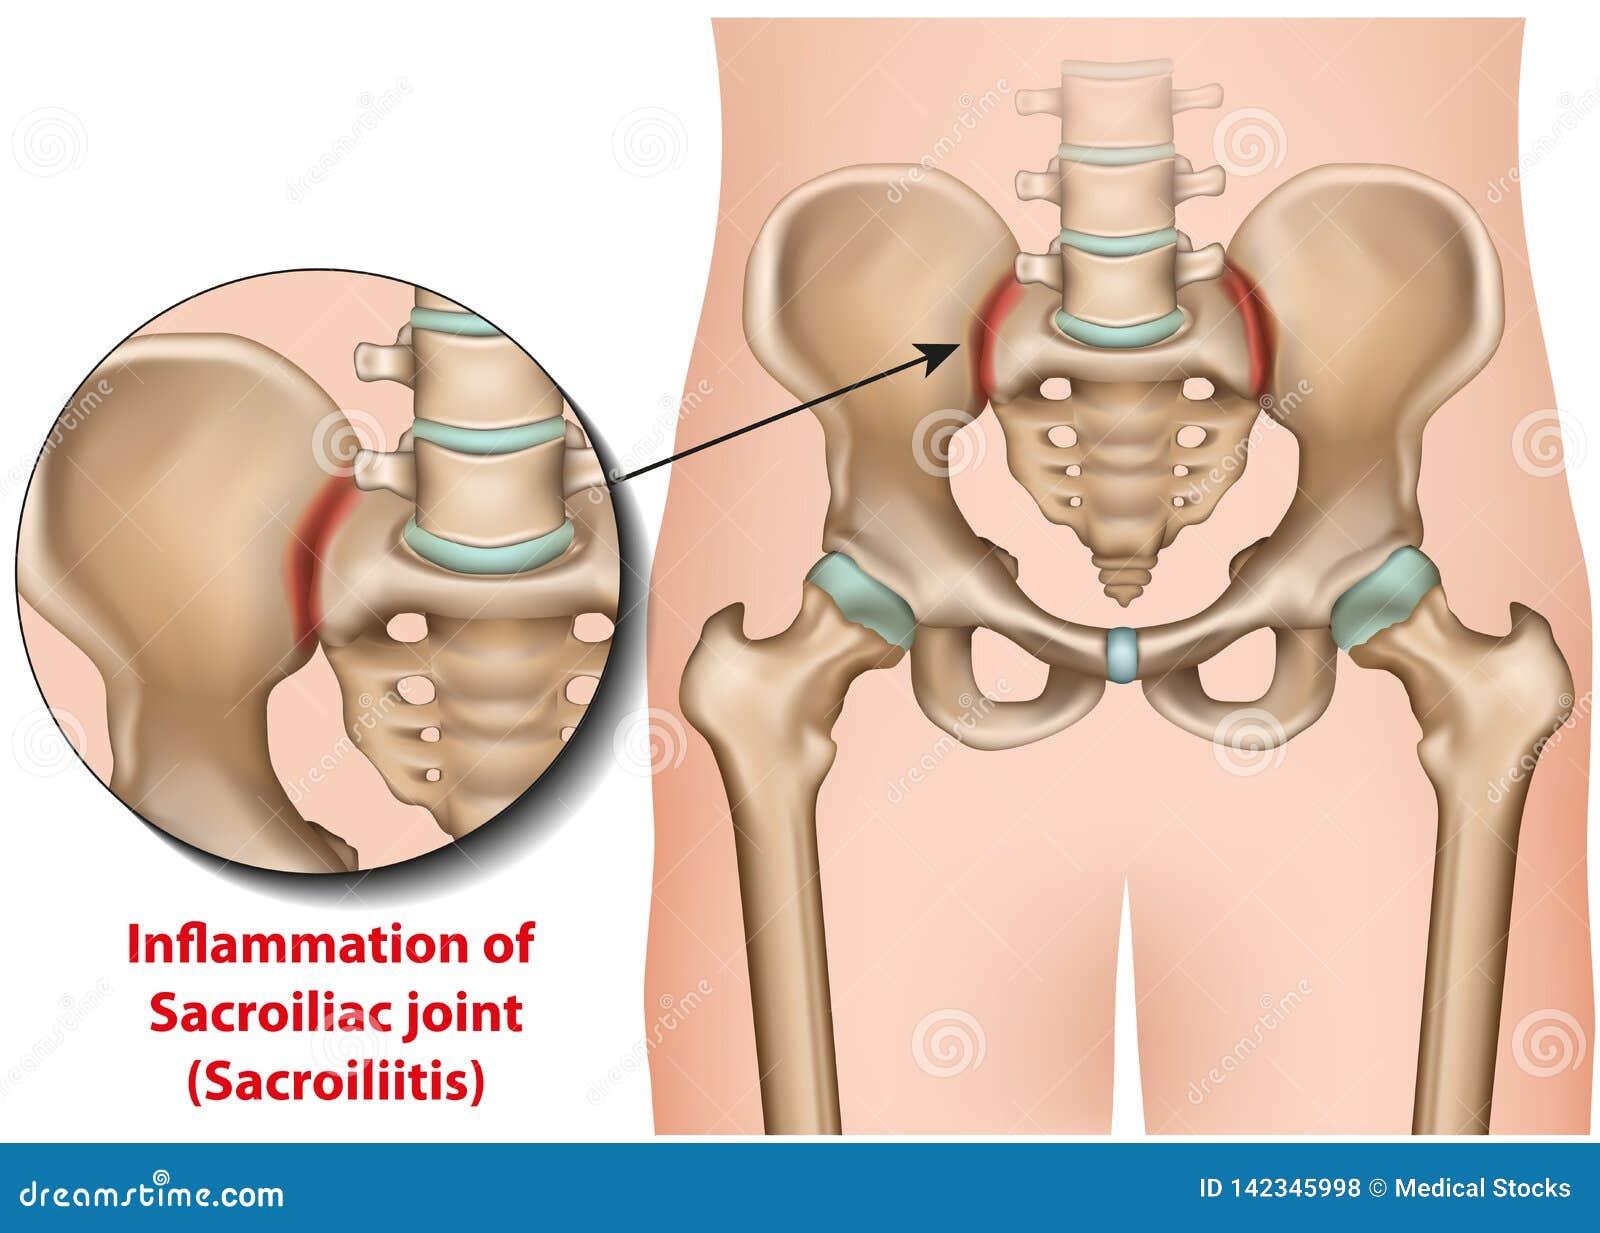 Sacroiliac gemeinsames medizinisches sacroiliitis Illustration der Entzündung 3d